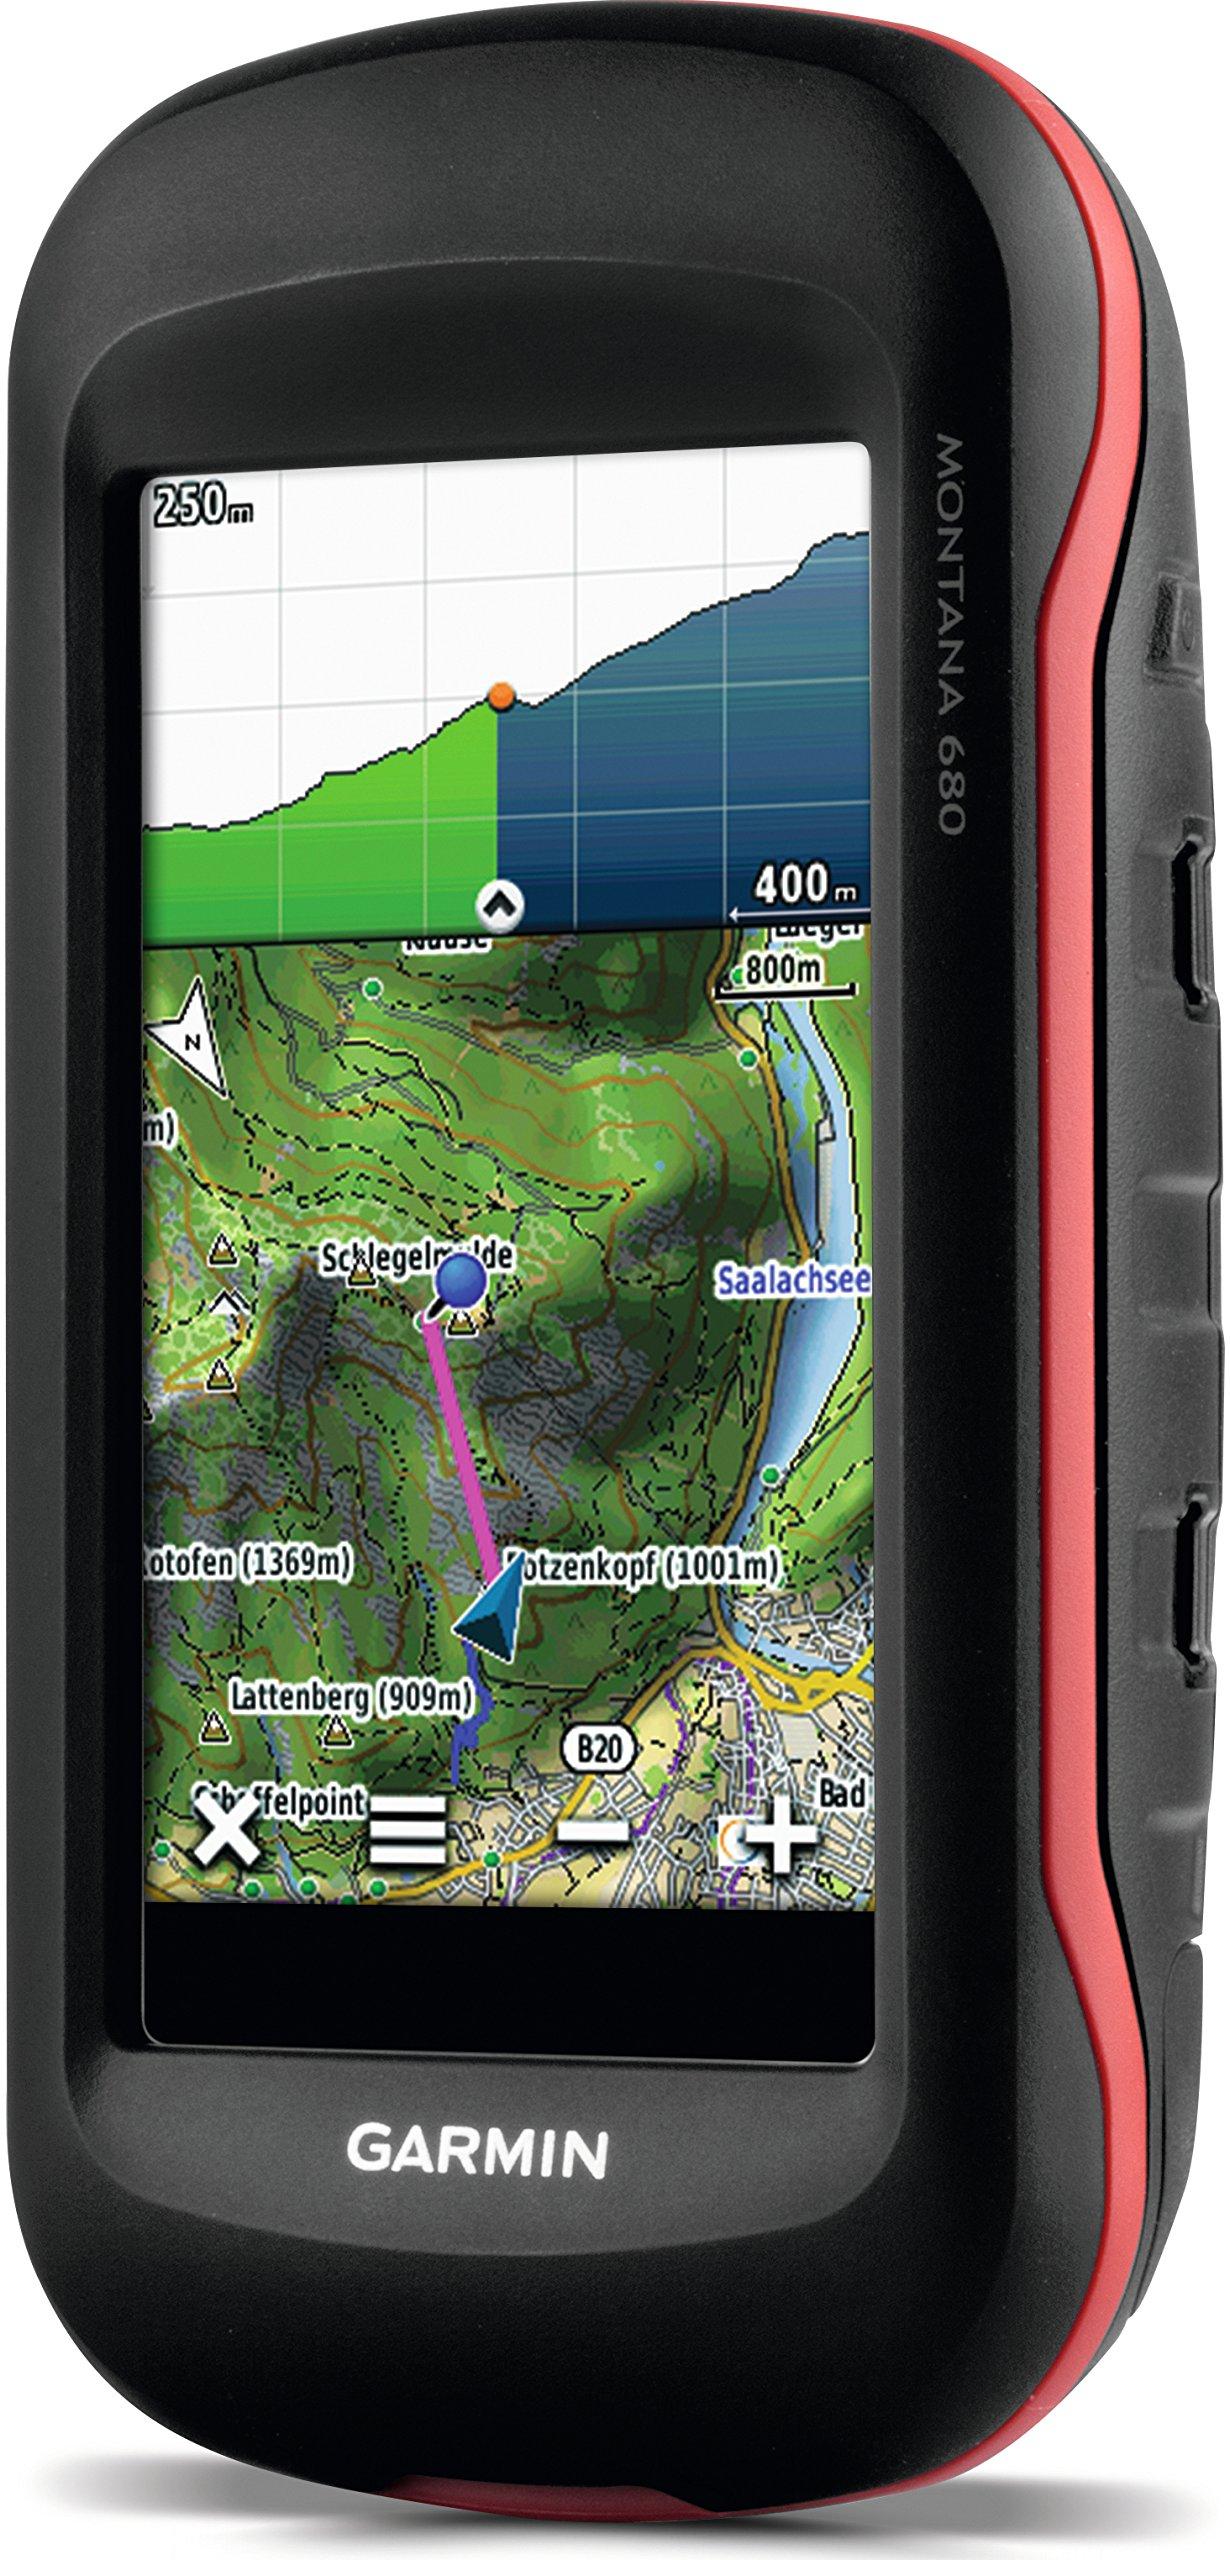 Garmin Montana 680 Touchscreen GPS/GLONASS Receiver, Worldwide Basemaps by Garmin (Image #4)